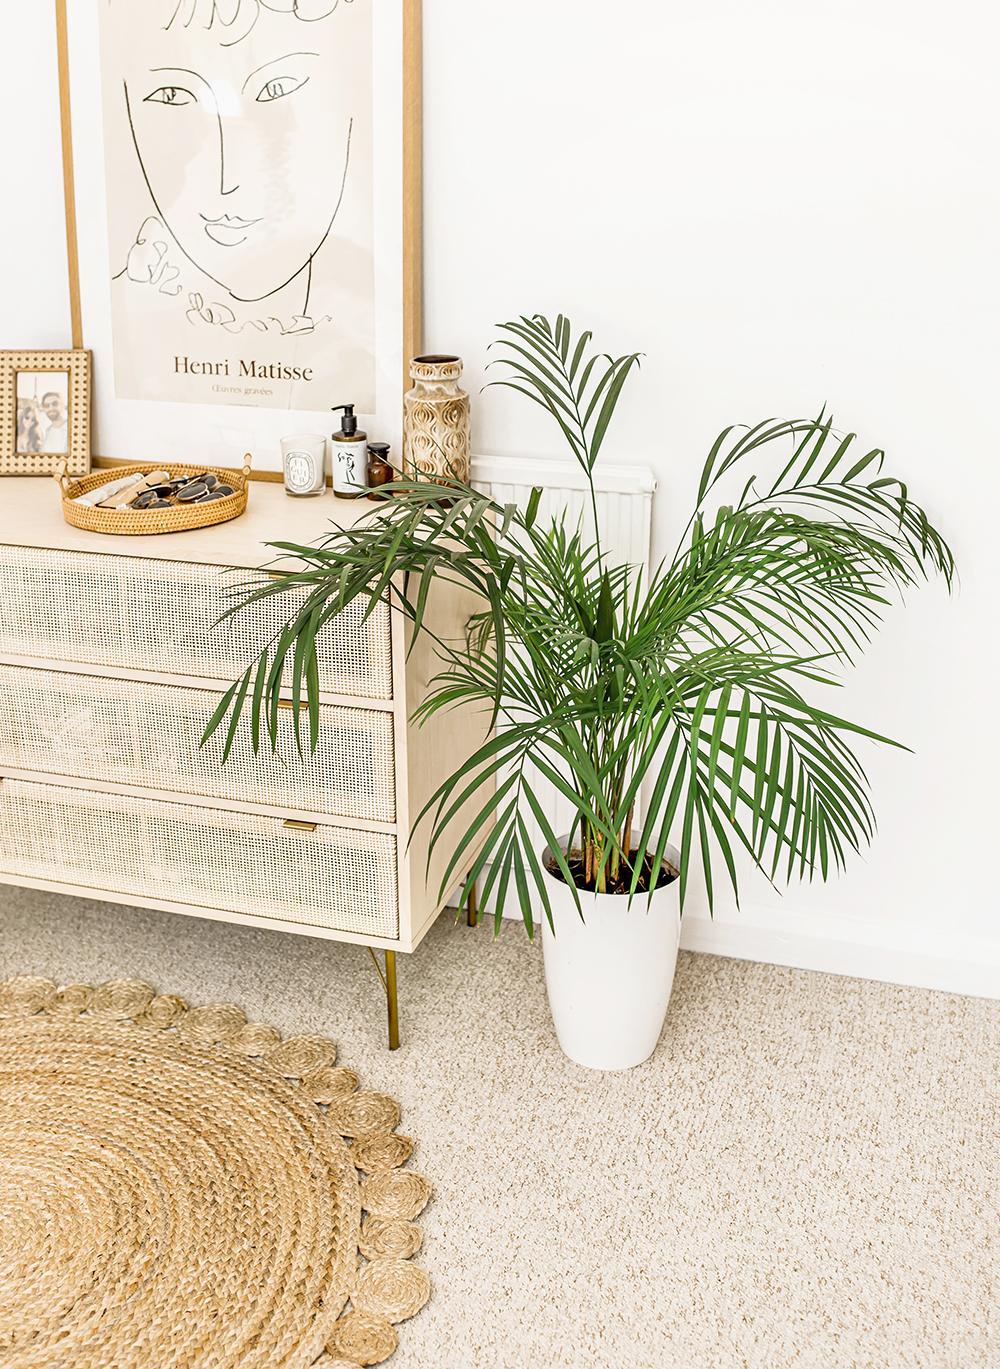 1-Acera-Palm-Chrysalidocarpus-lutescens-kelseyinlondon-homewithkelsey-plant-guide-best-indoor-plants